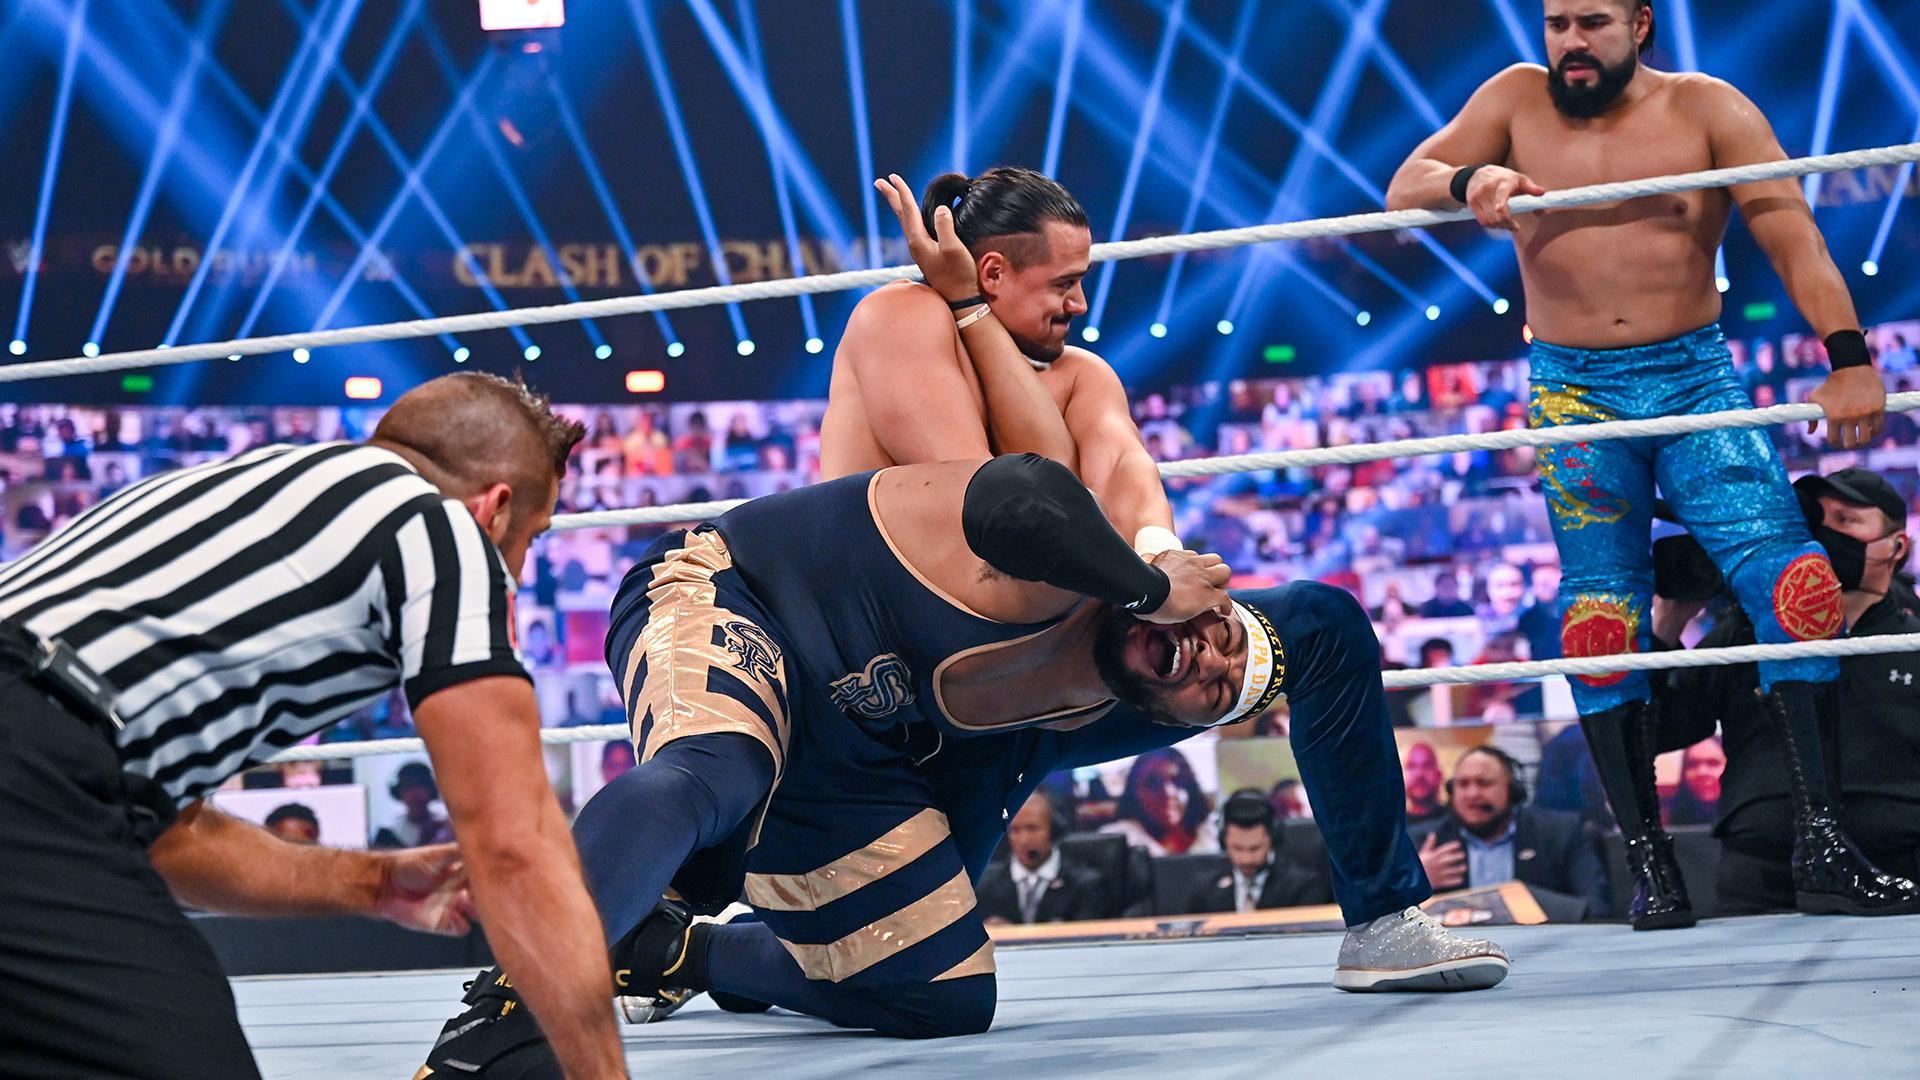 Angel Garza pode ter se lesionado durante seu combate no WWE Clash of Champions